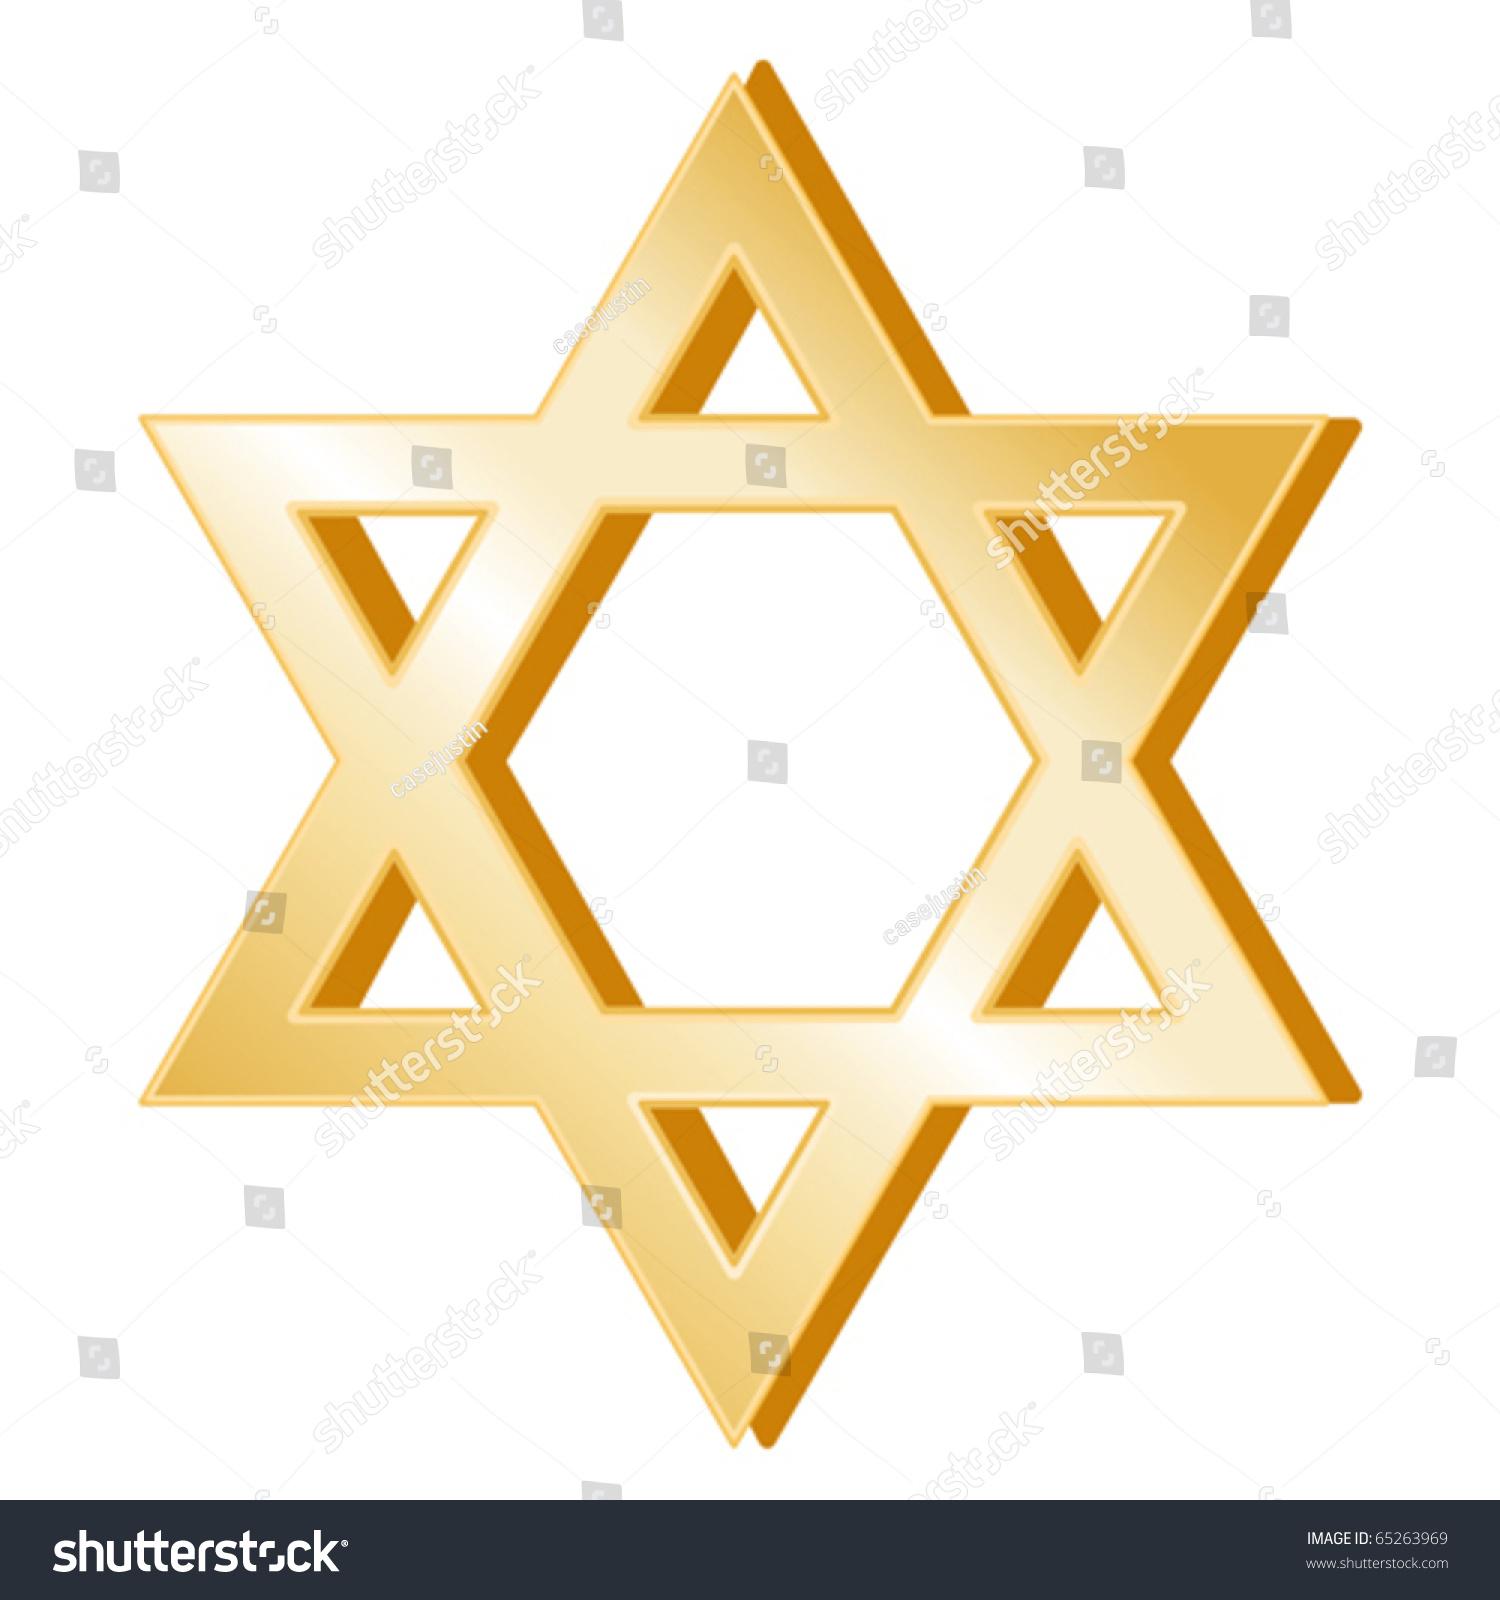 Golden Star Of David Religious Symbol Vector Illustration Ez Canvas